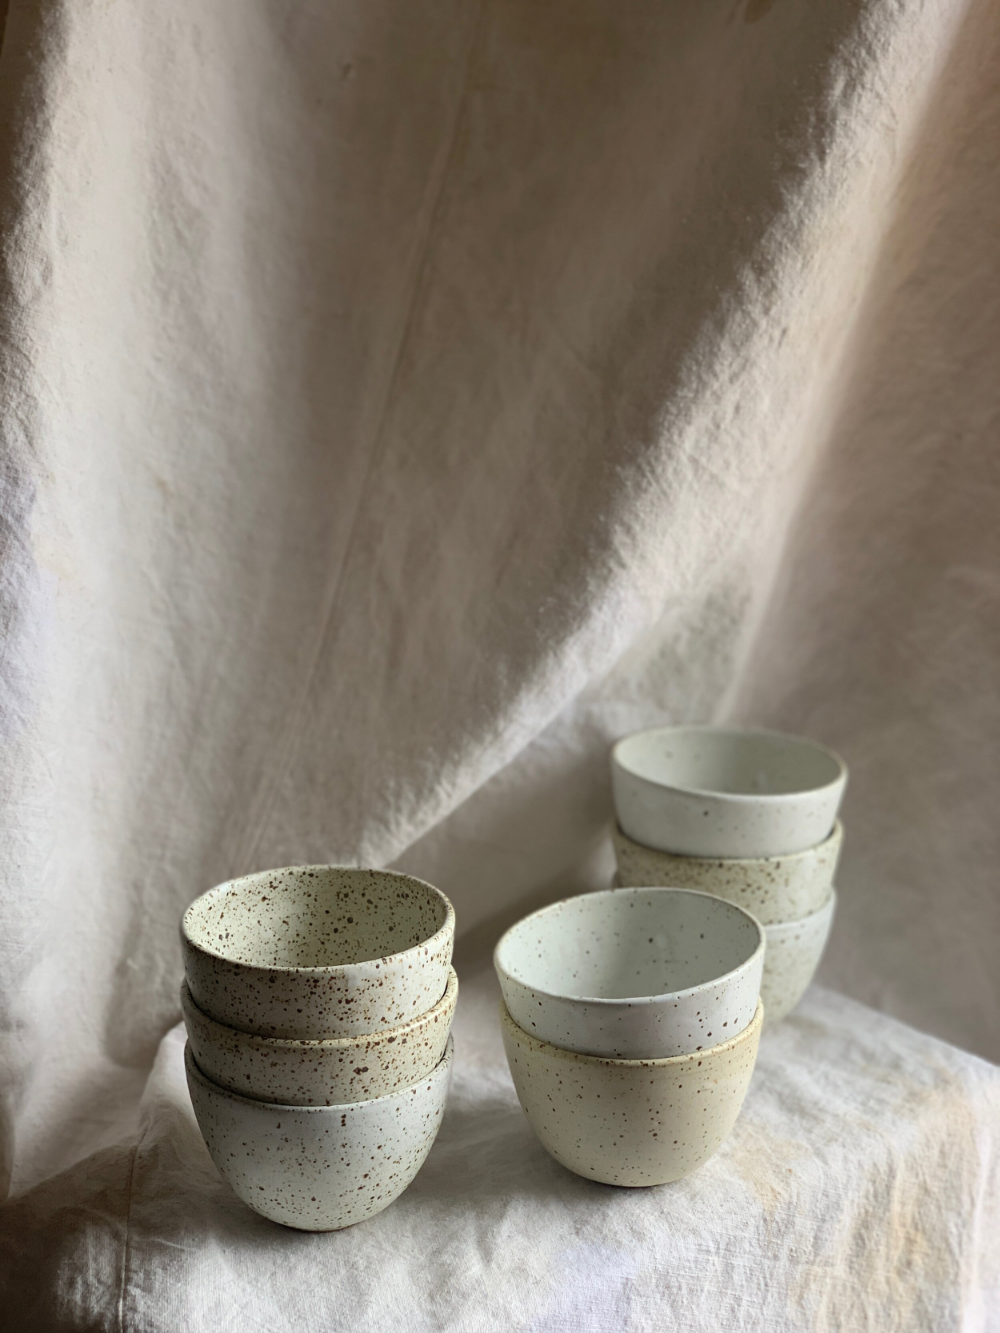 Gallery — MANU #whiteceramics #interiordesign #tableware #ceramics #handmade #pottery #propstyling #manueveryday #functionalceramics #handcrafted #stoneware #photographyprop #foodstyling #craft #contemporaryceramics #contemporarycraft #shino